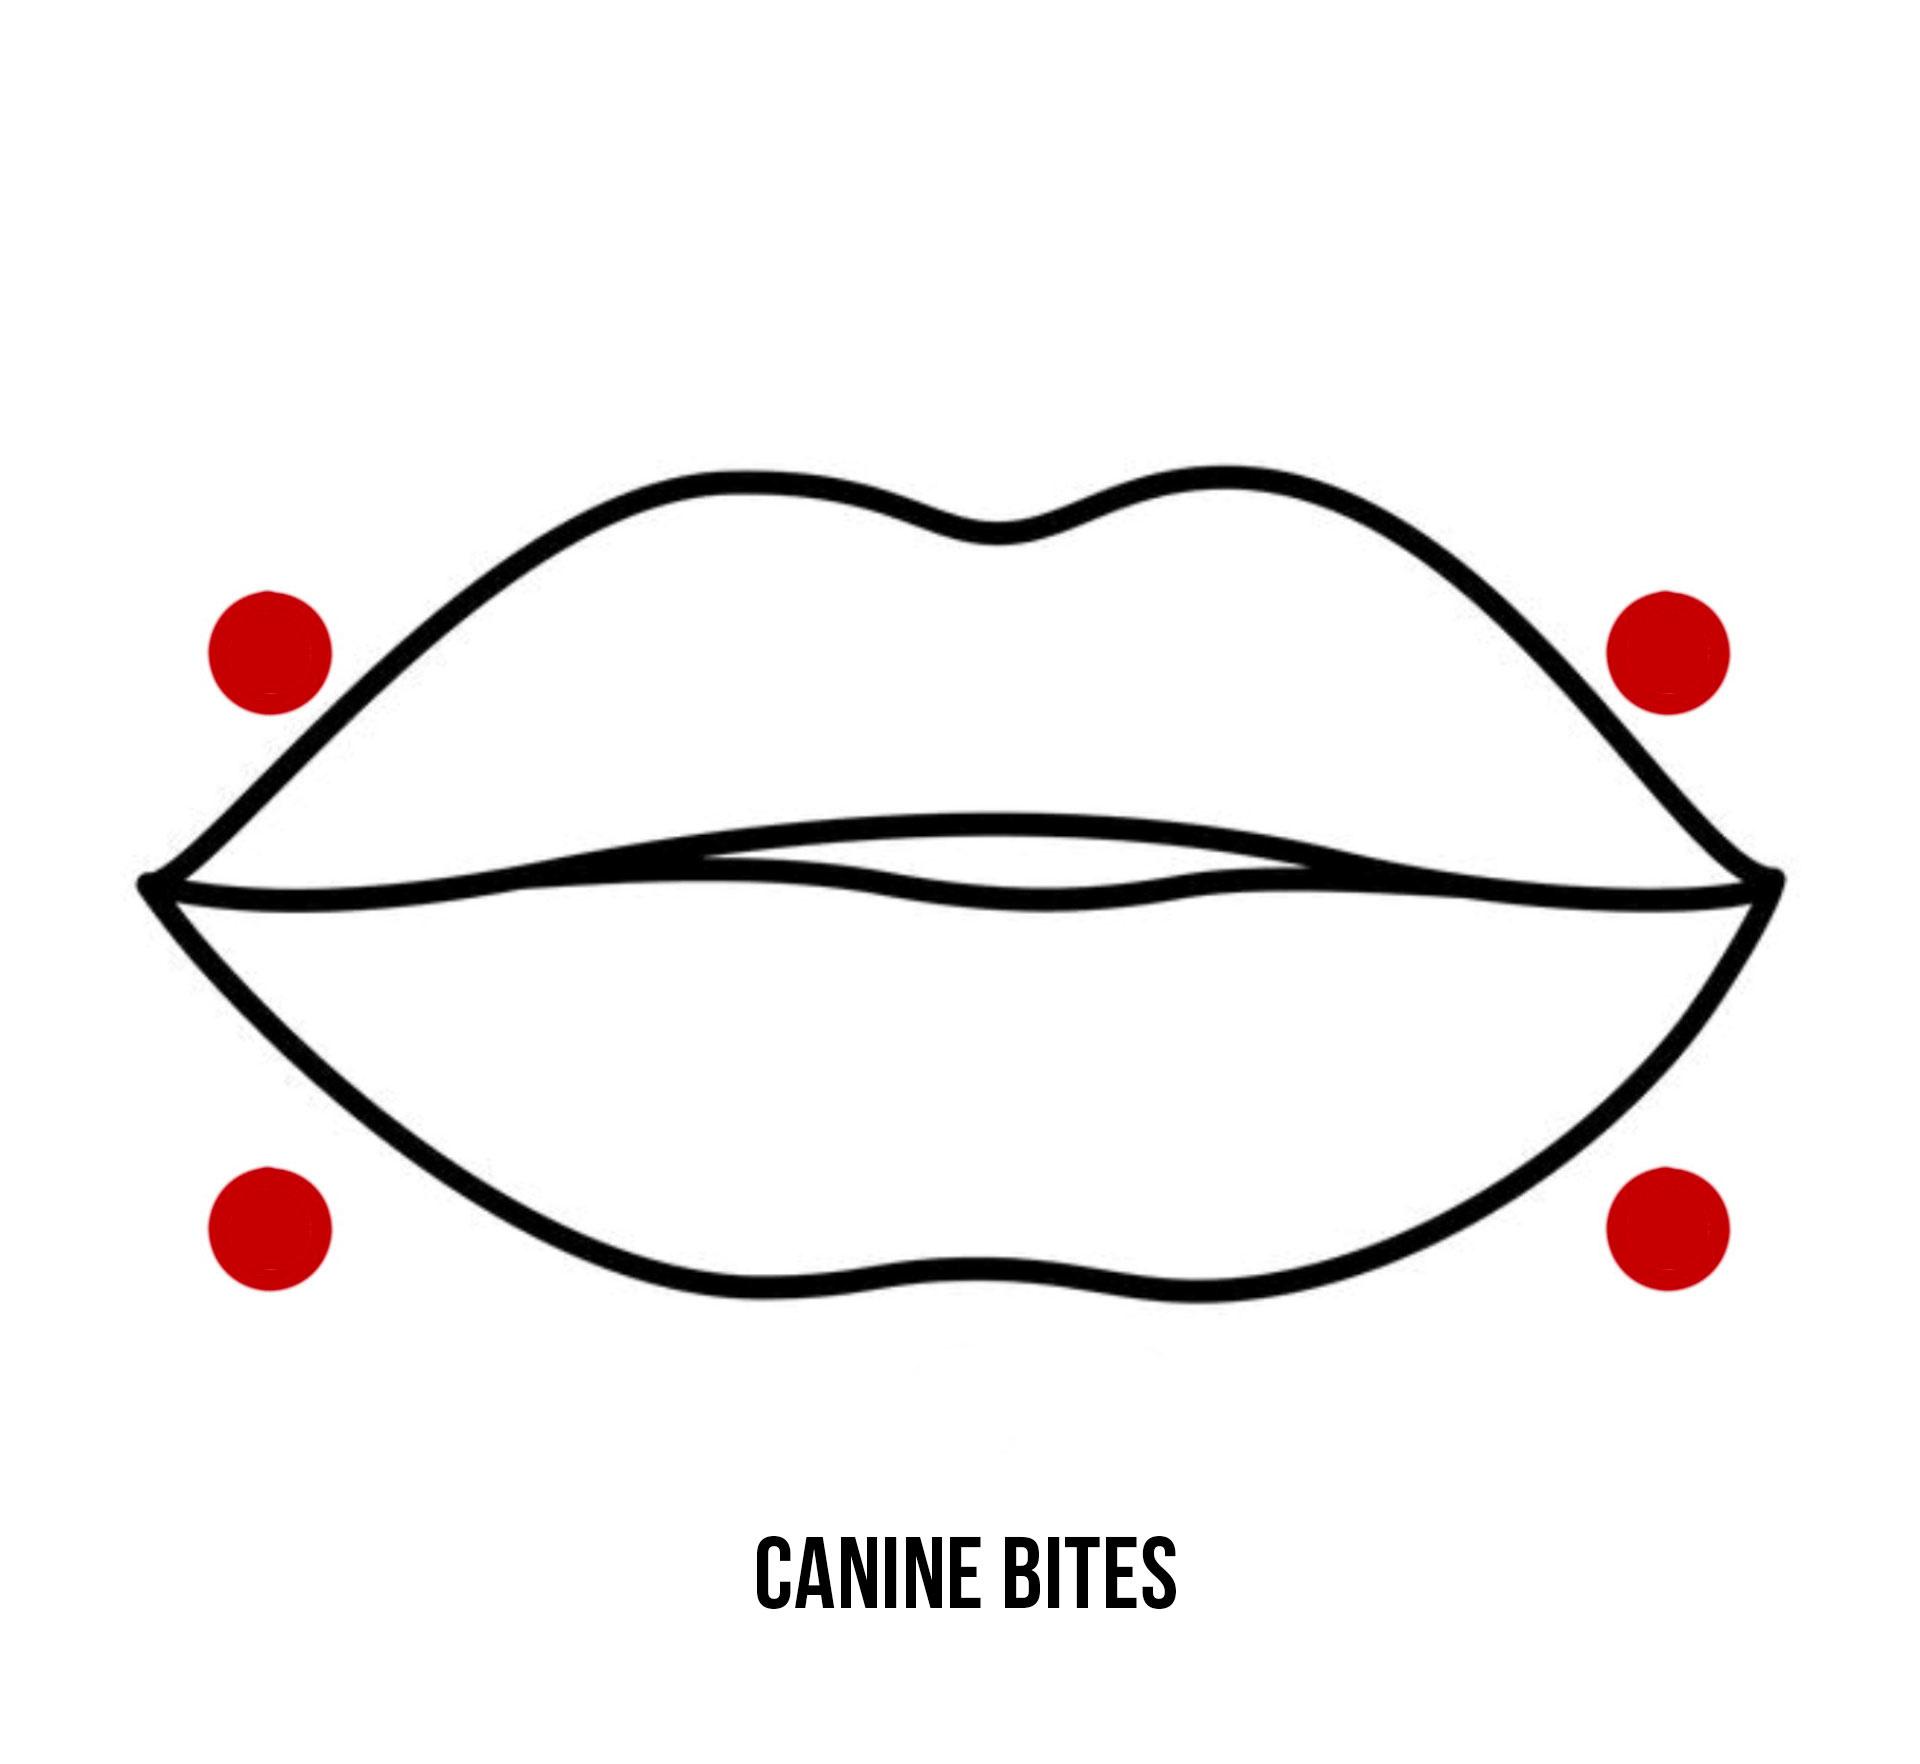 Canine Bites